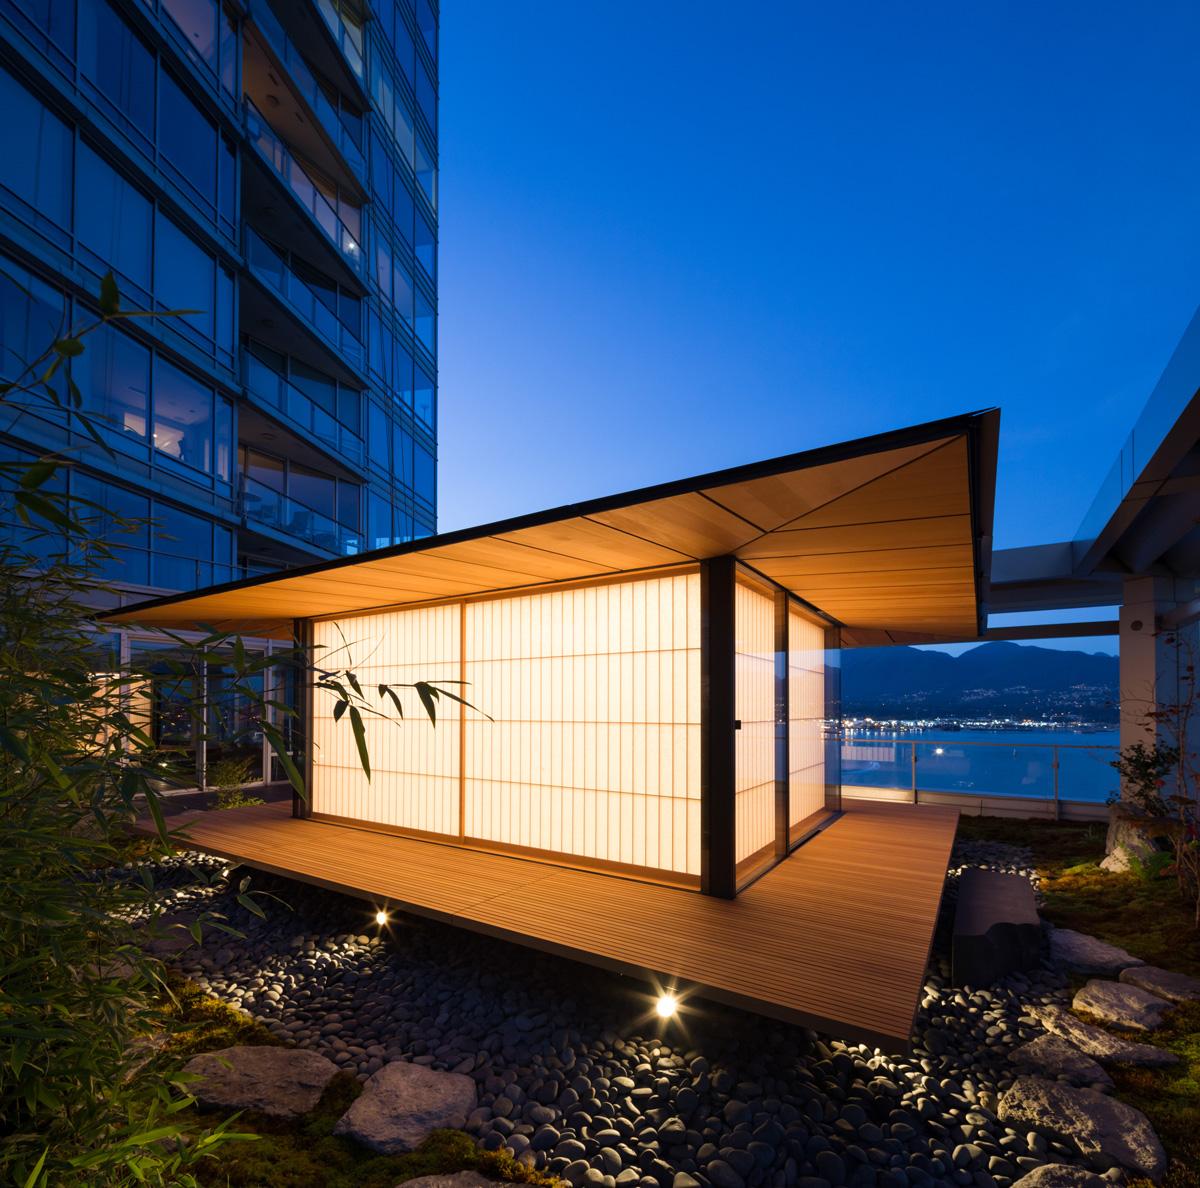 Vancouver Tea House ヴァンクーヴァー茶室 Architecture Kengo